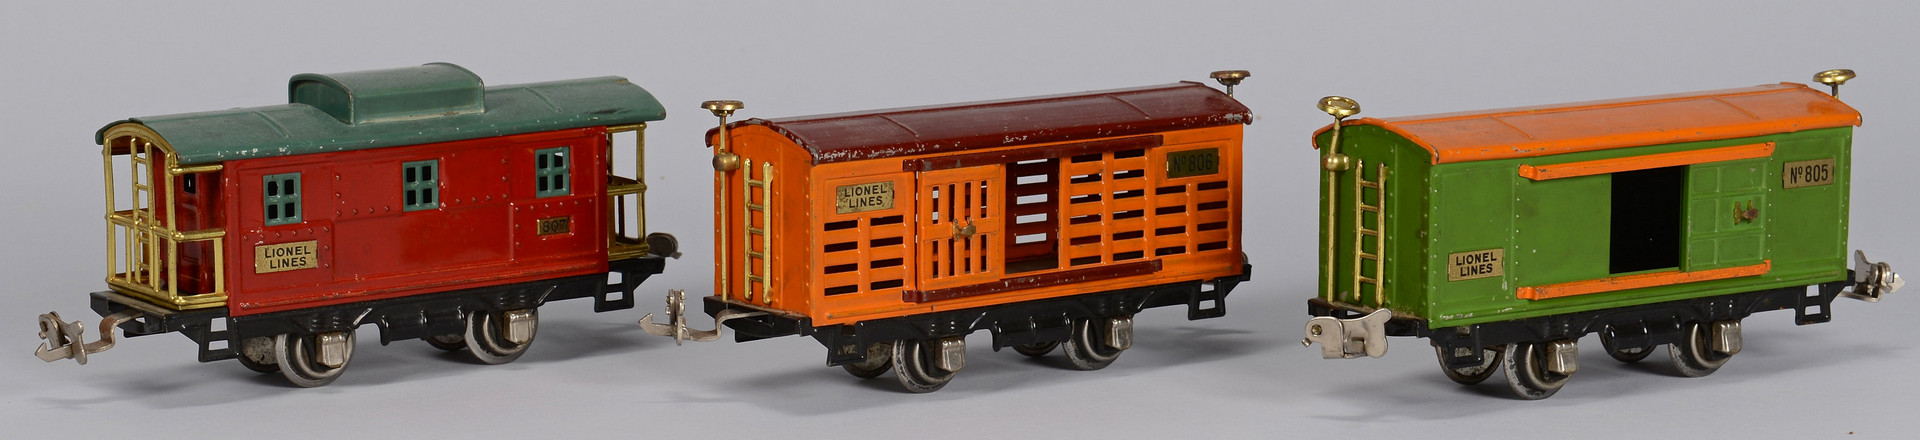 Lot 467: Lionel O Gauge Train Set